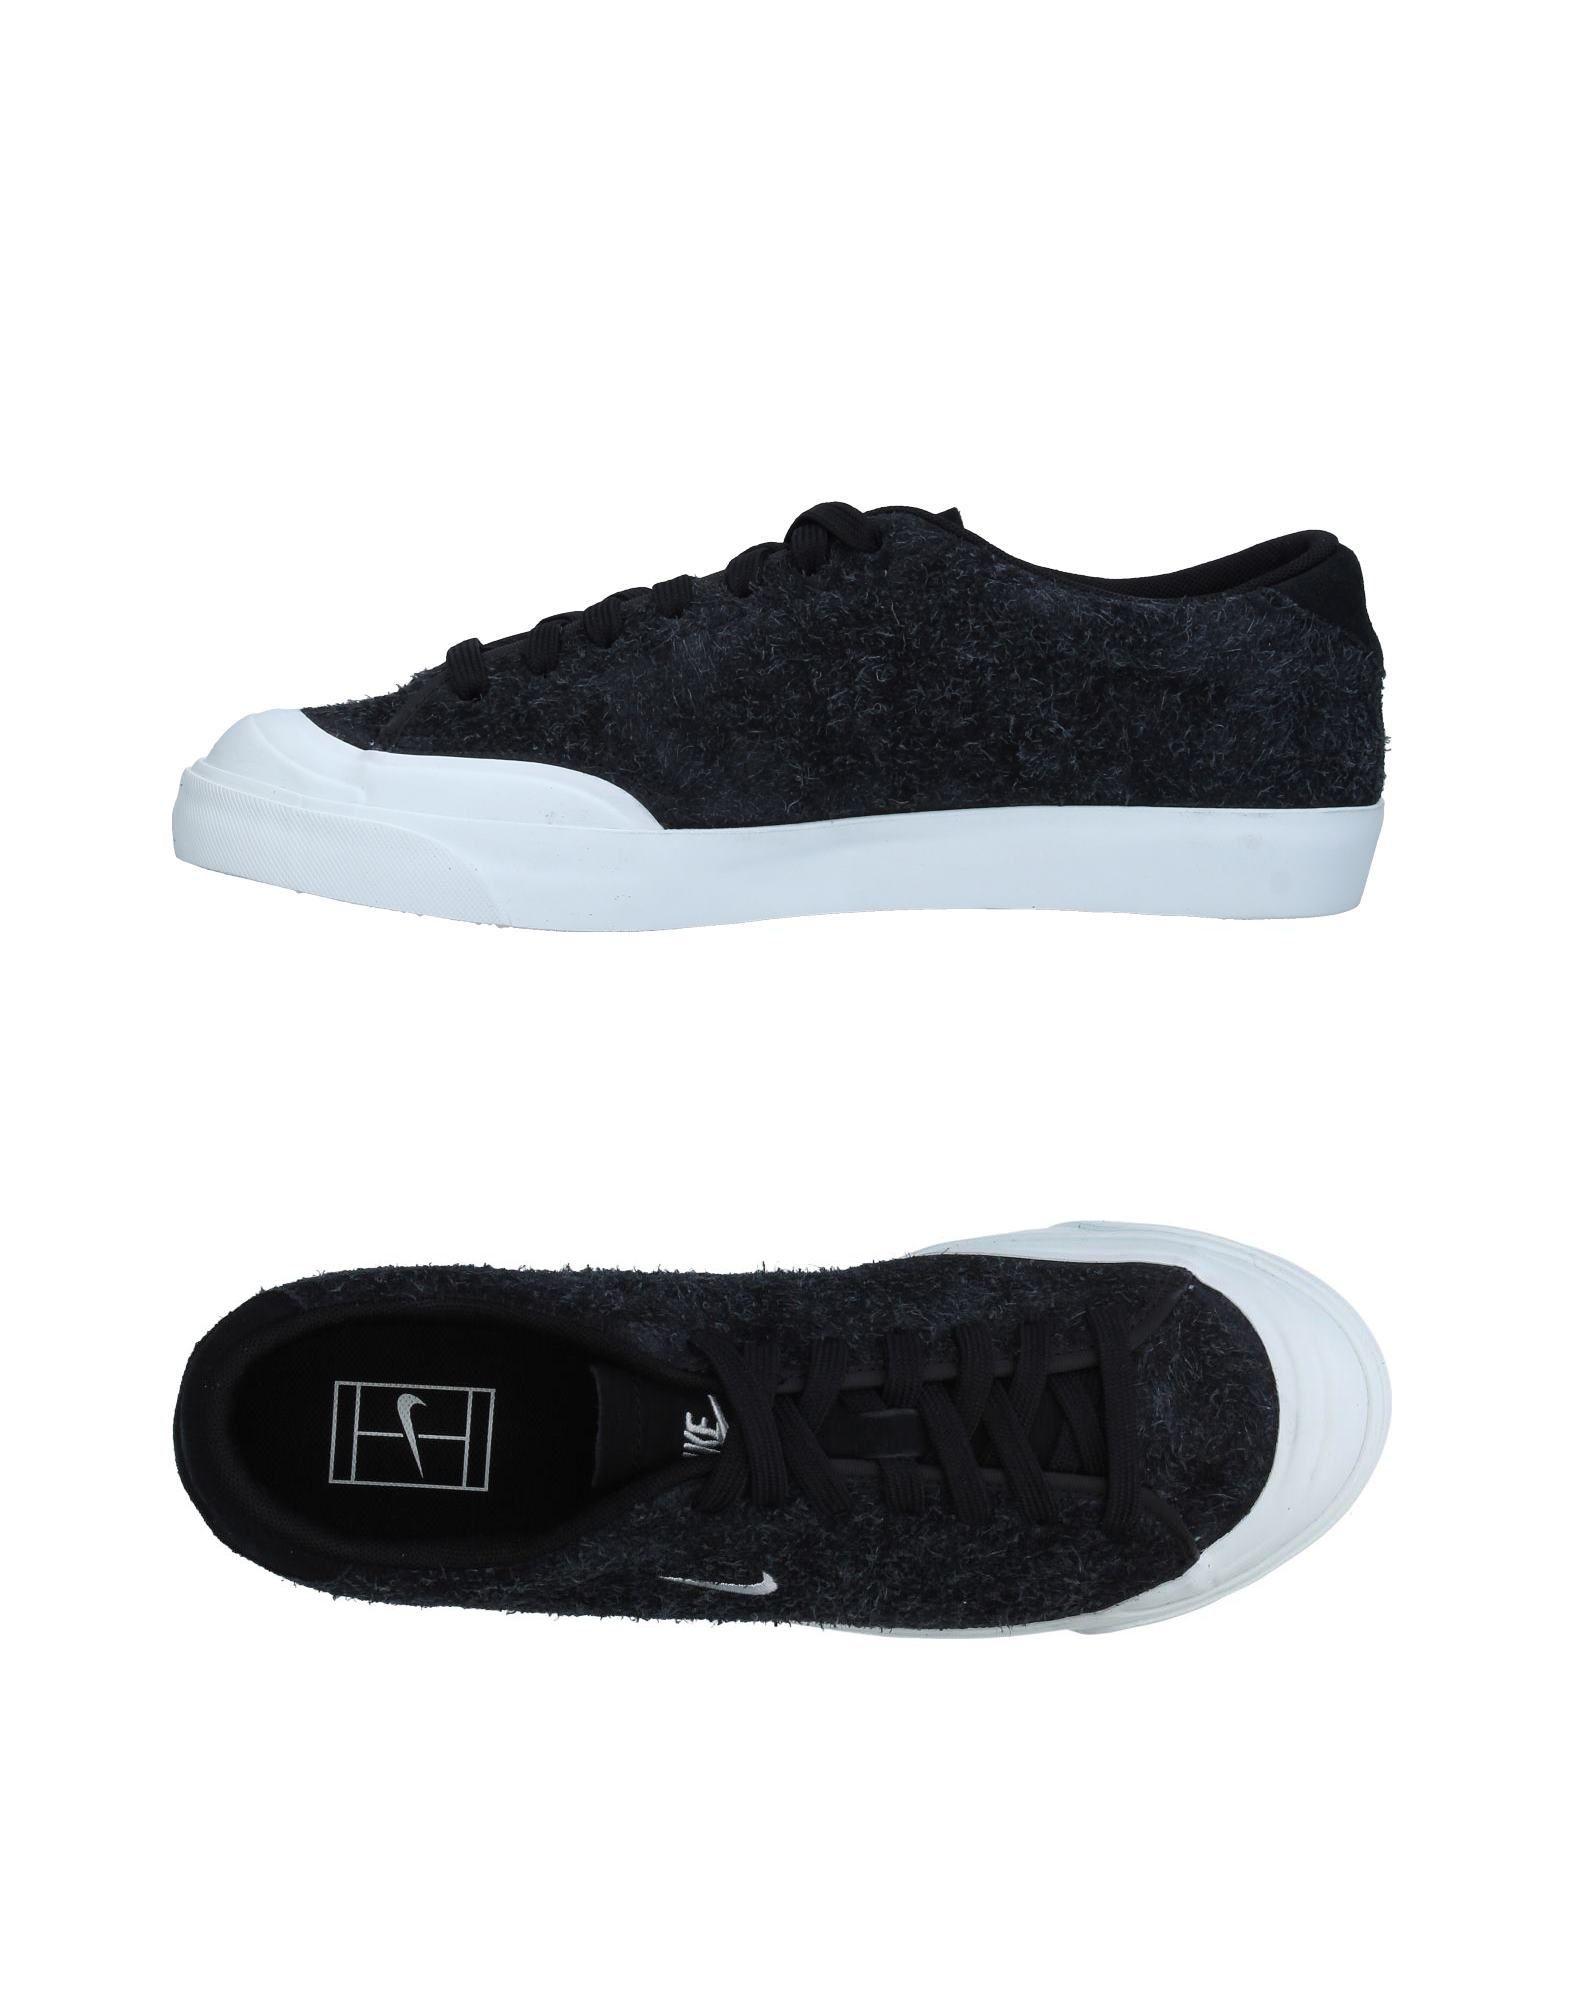 Rabatt echte Schuhe Nike Sneakers 11335719QF Herren  11335719QF Sneakers 02ac94